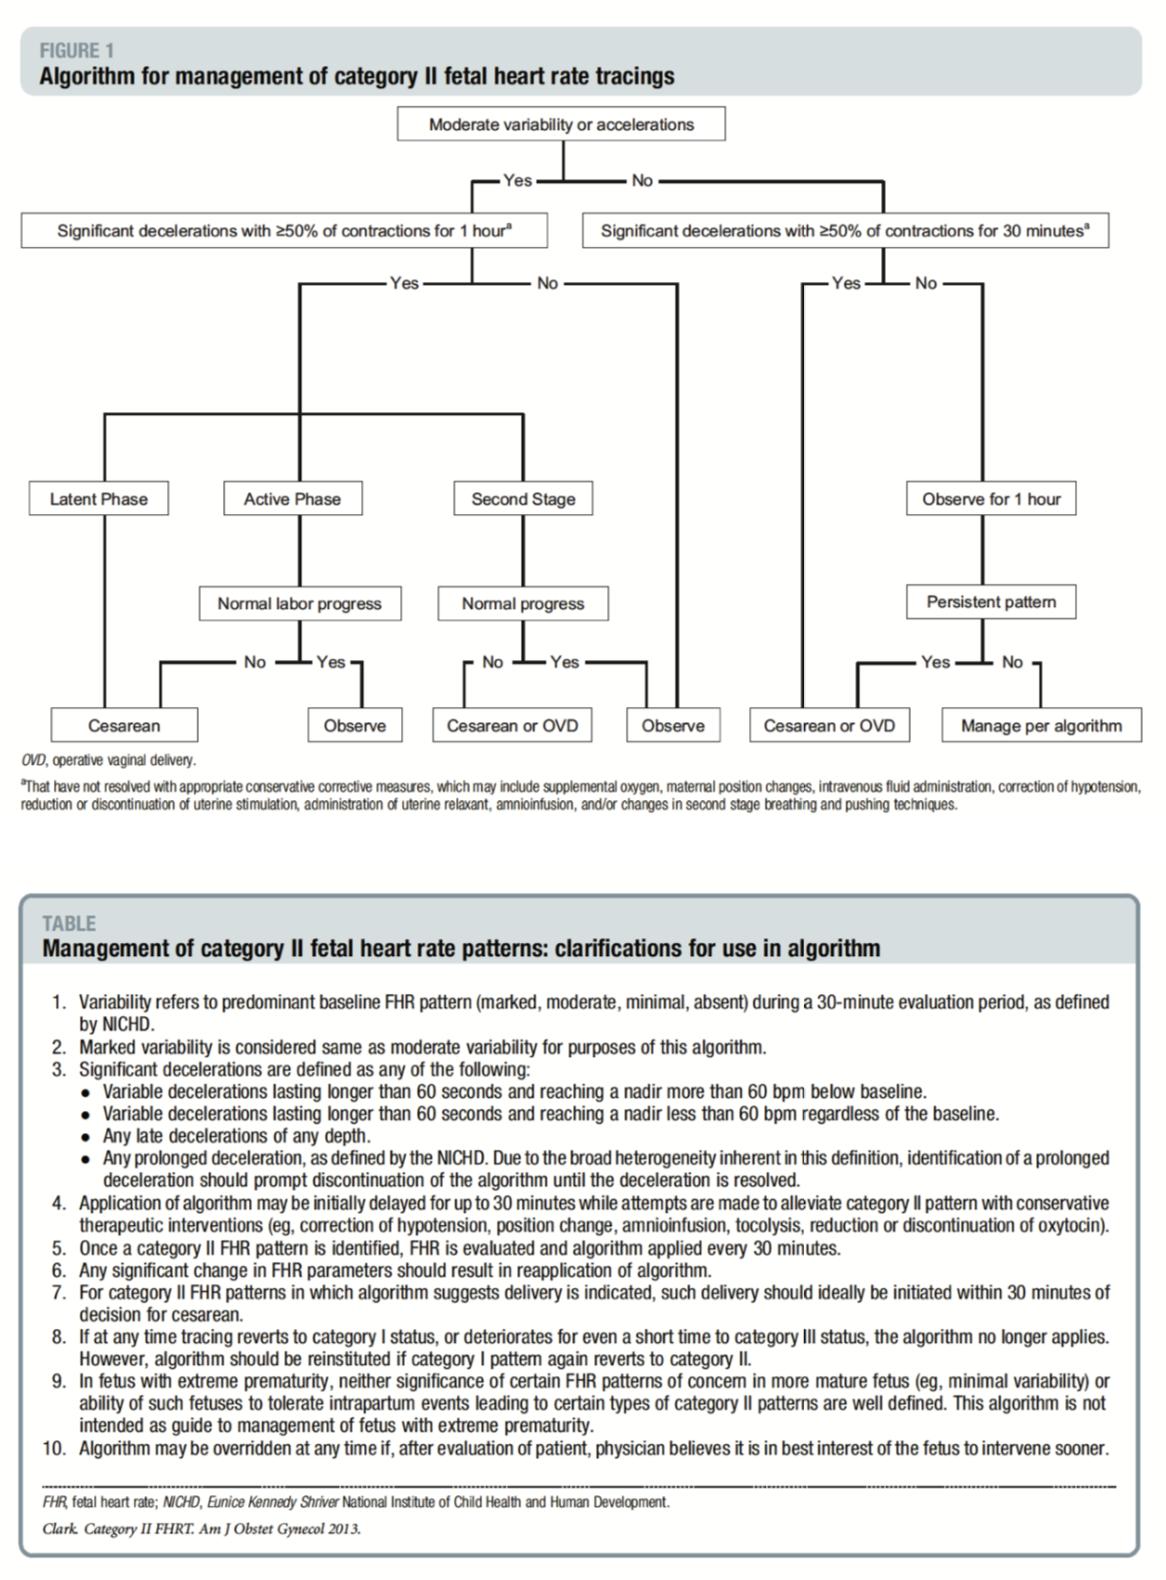 Clark et al. (AJOG 2013)